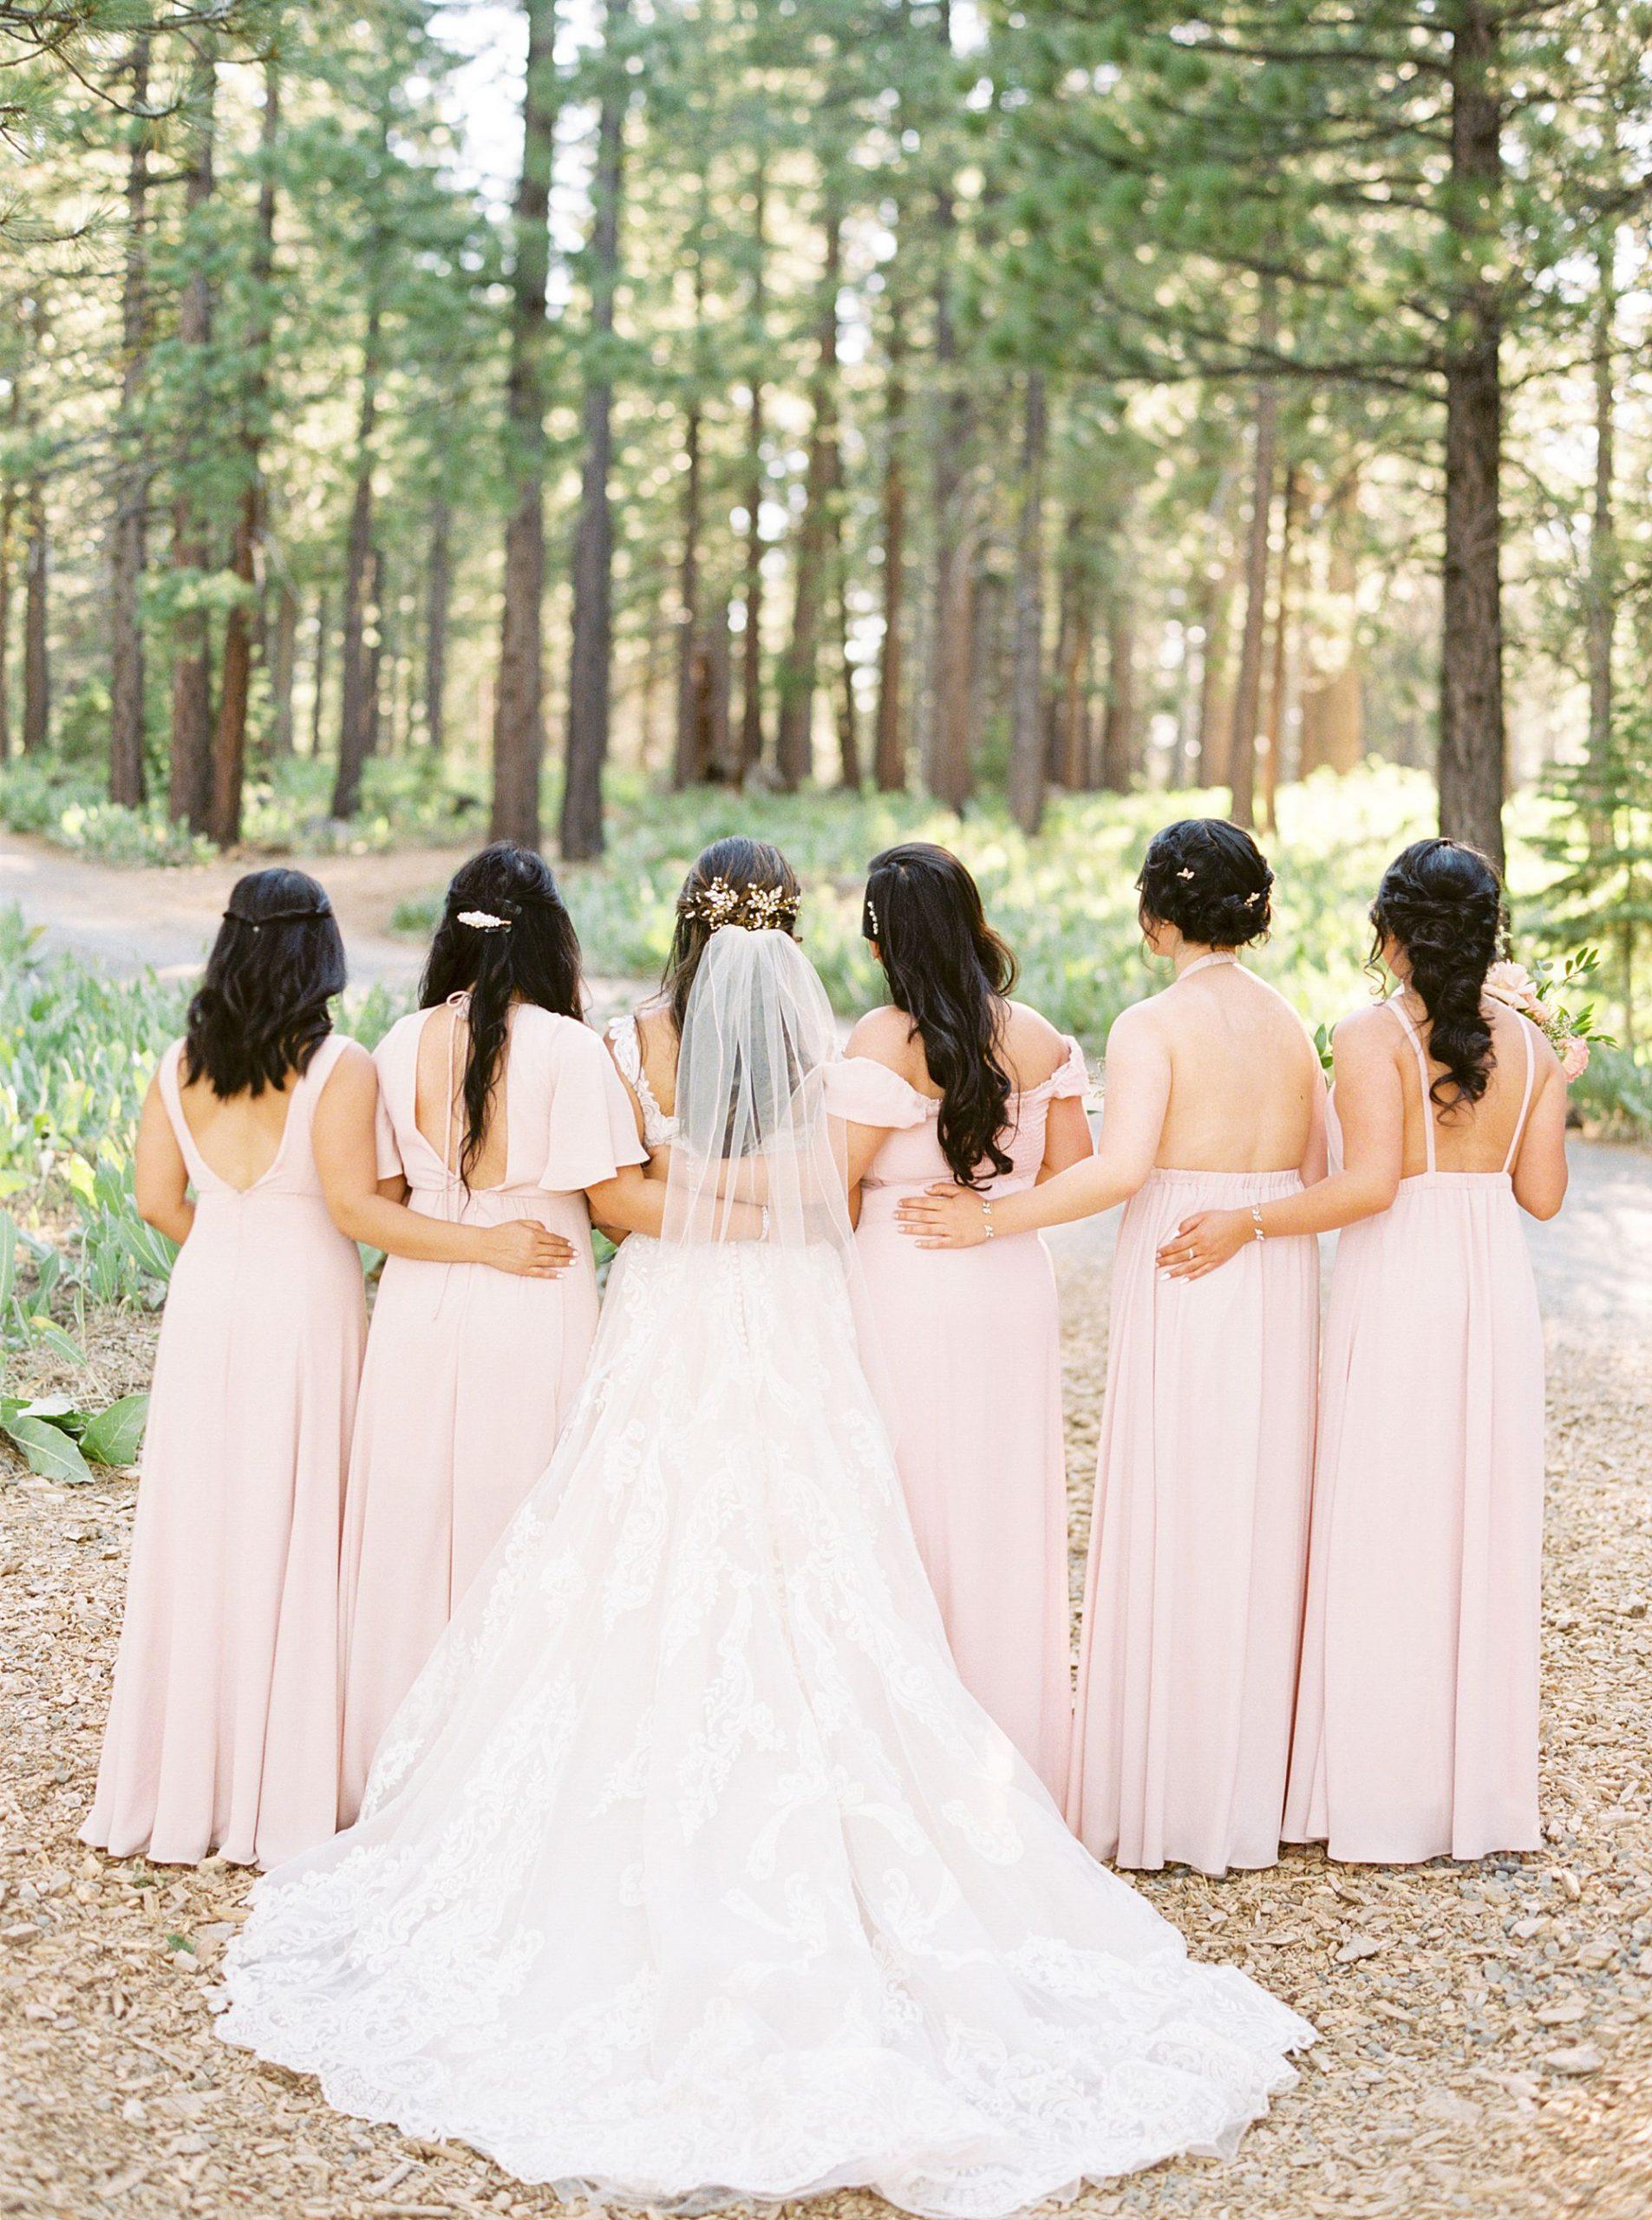 MITCHELLS MOUNTAIN MEADOWS Wedding - Ash Baumgartner - Phallina and Matt - Sierraville Wedding - Tahoe Wedding Photography_0023.jpg